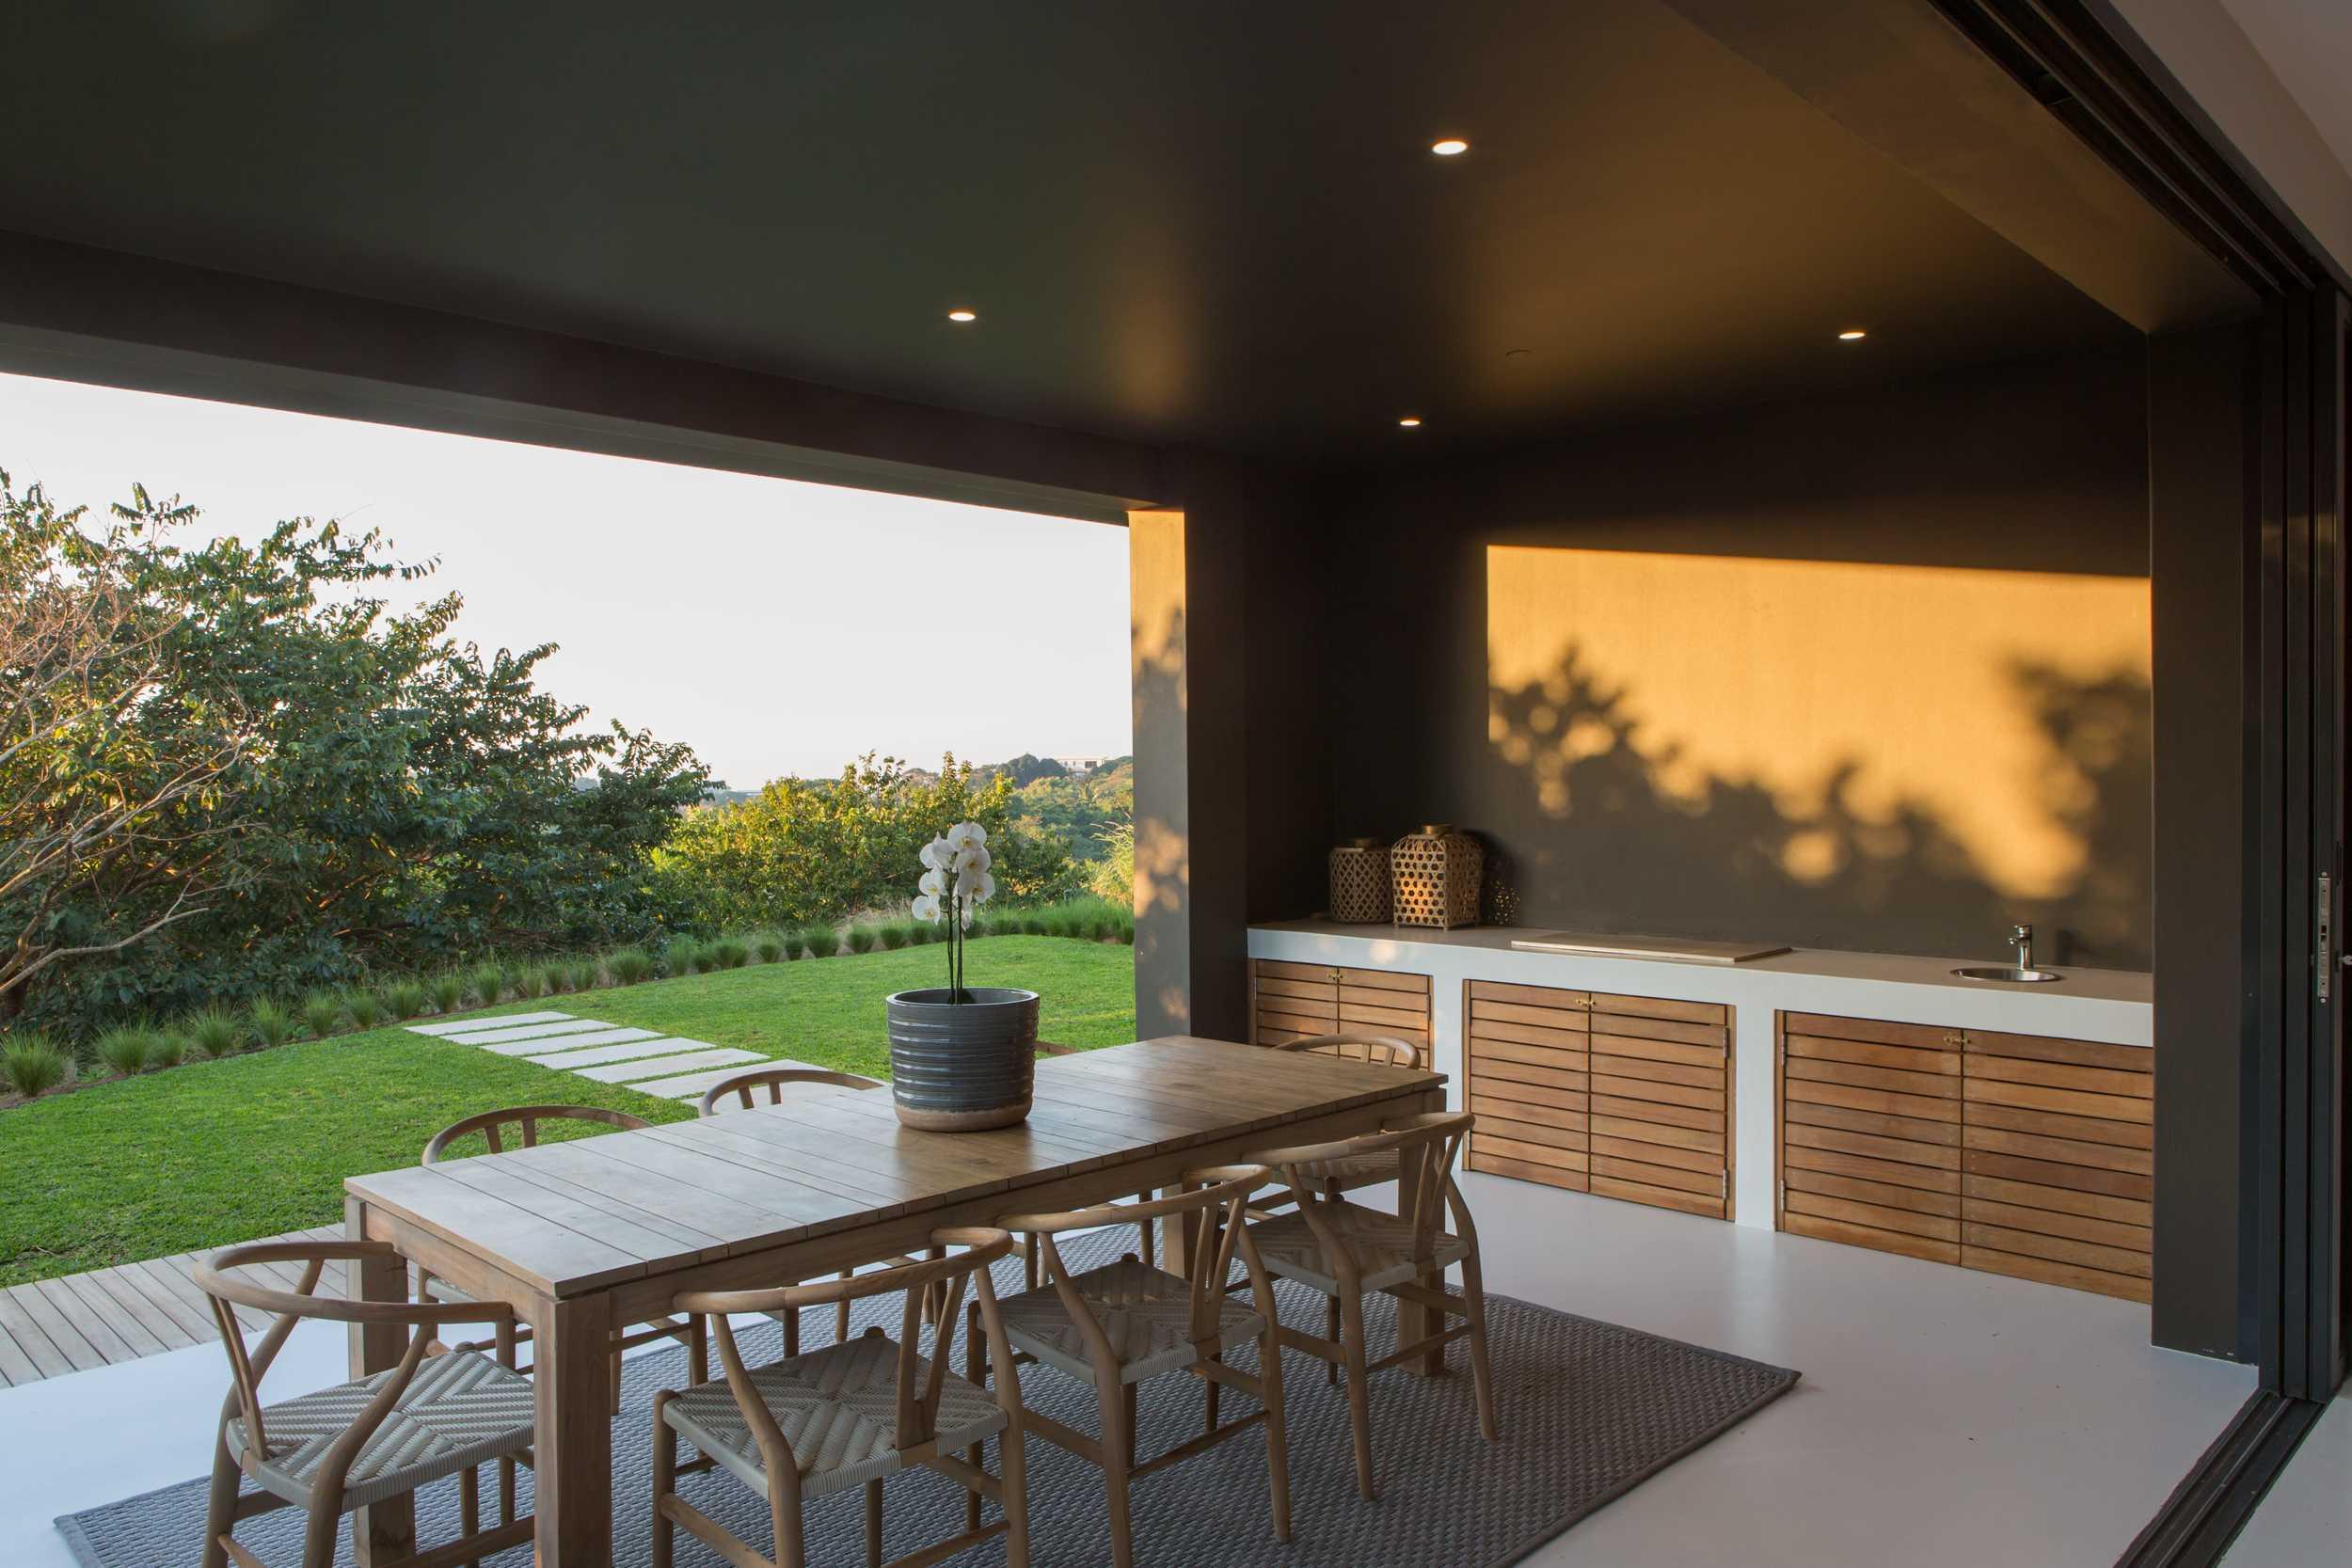 julia-rutherfoord-architect-dunkirk-estate-2015-02.jpg